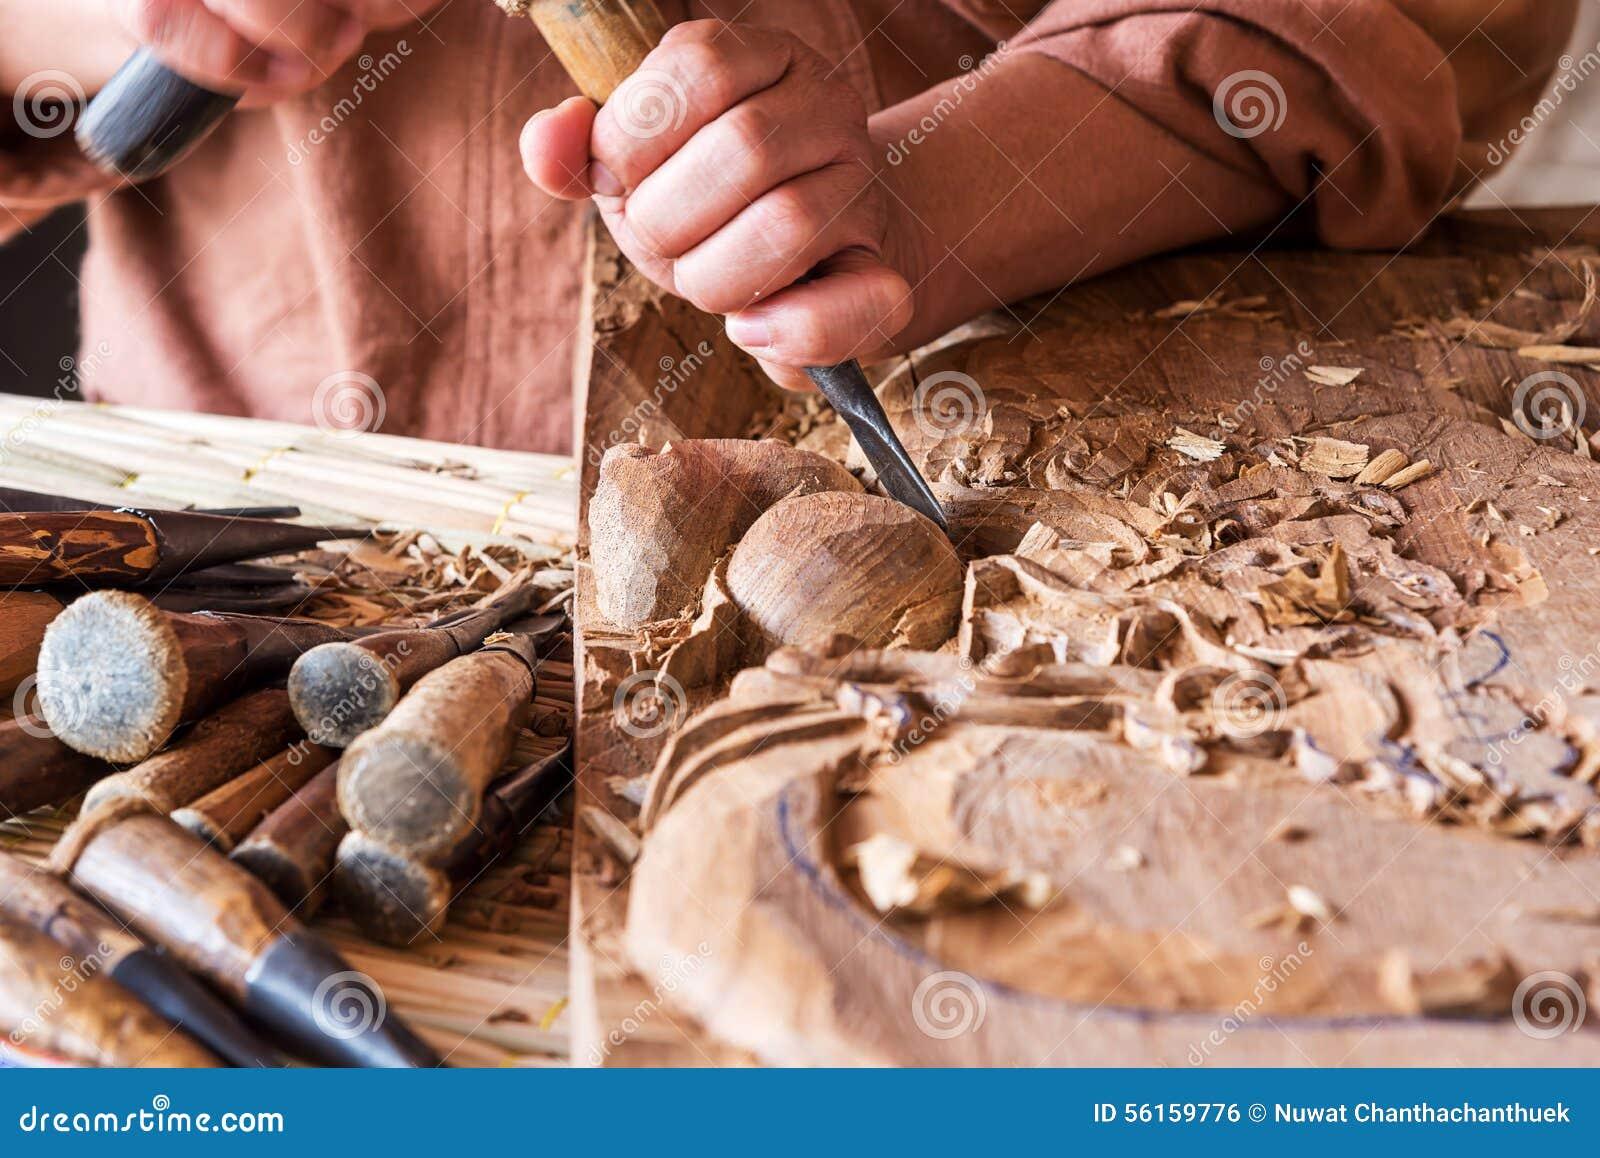 talla de madera del artesano foto de archivo